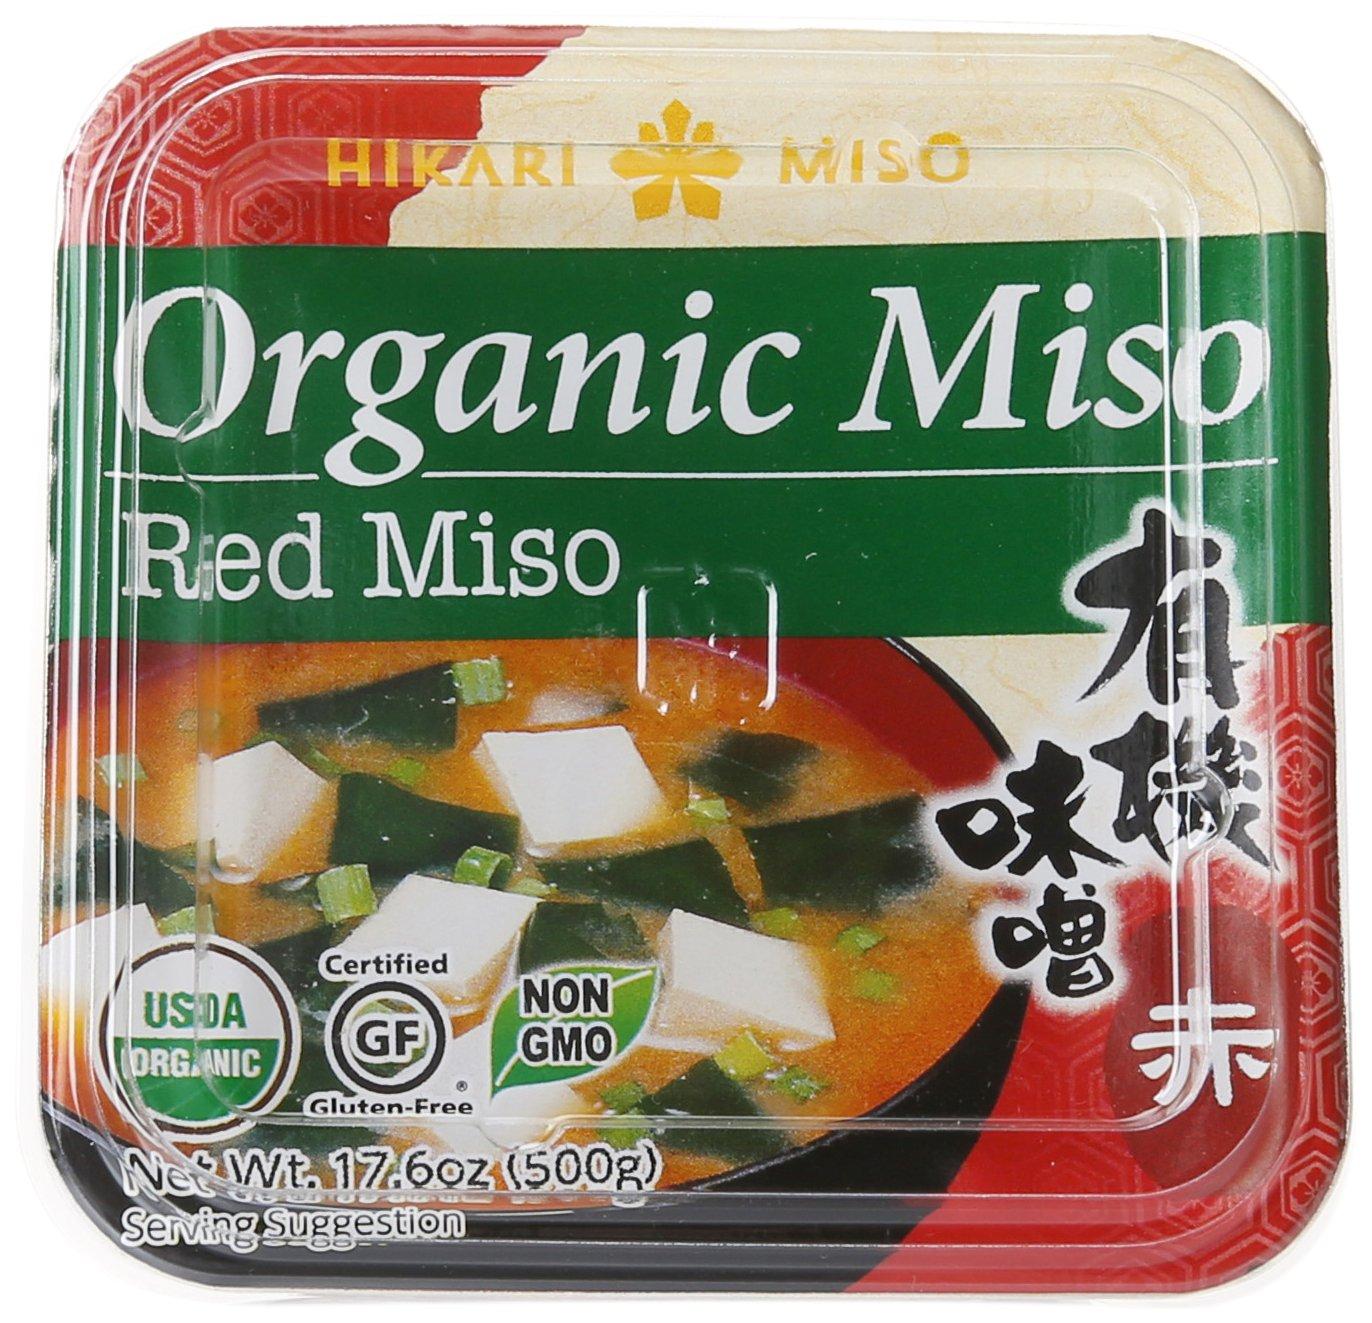 Hikari Organic Miso Paste, Red, 17.6 oz